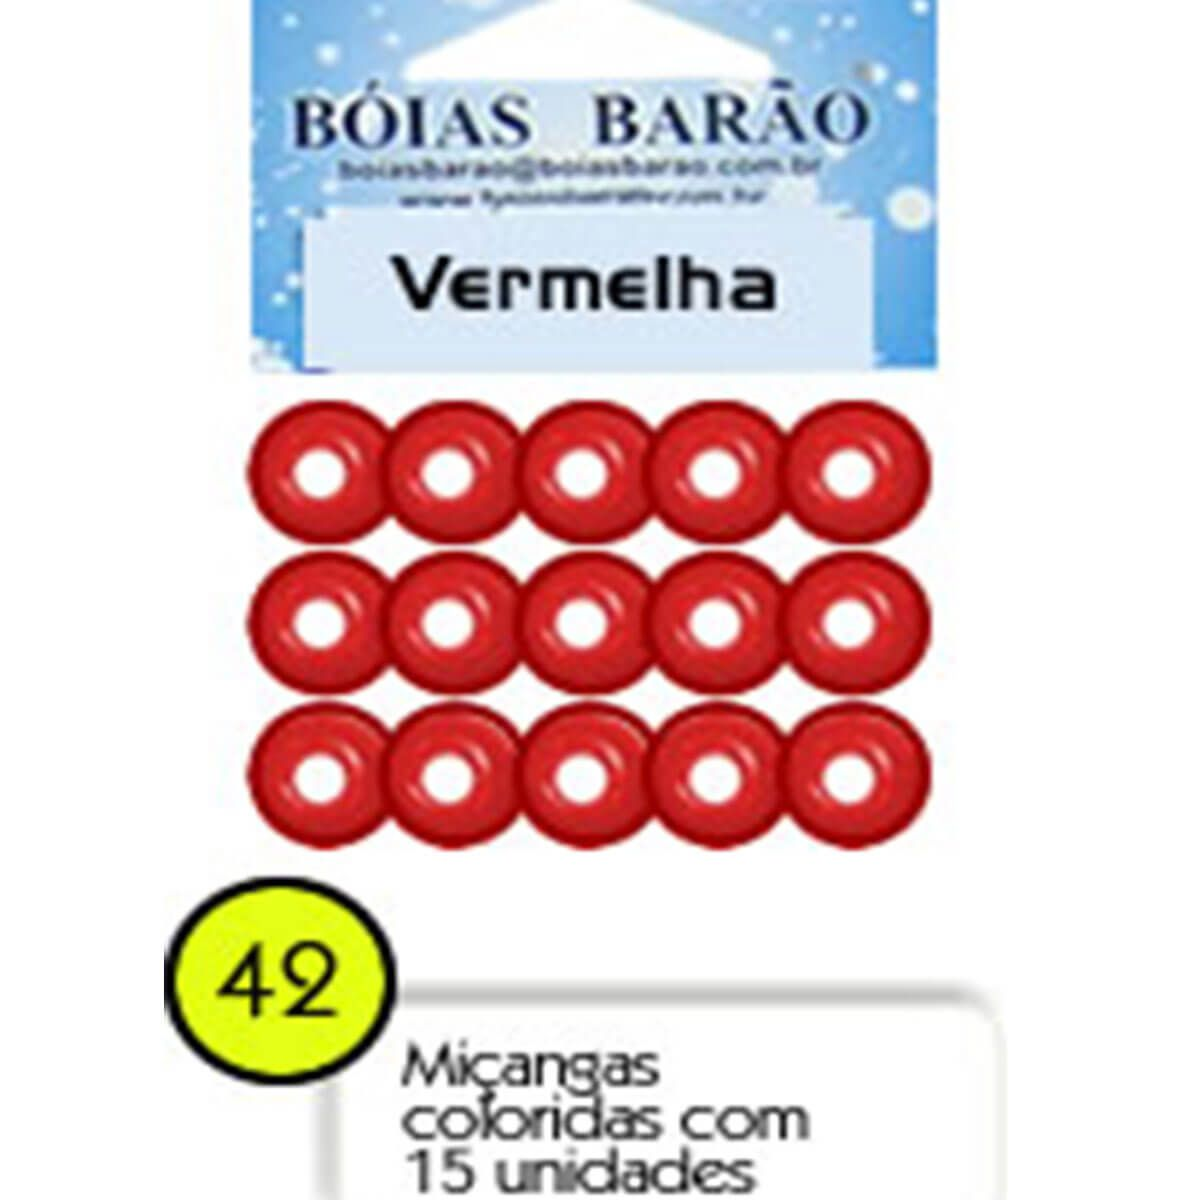 Miçangas Boias Barão 15un